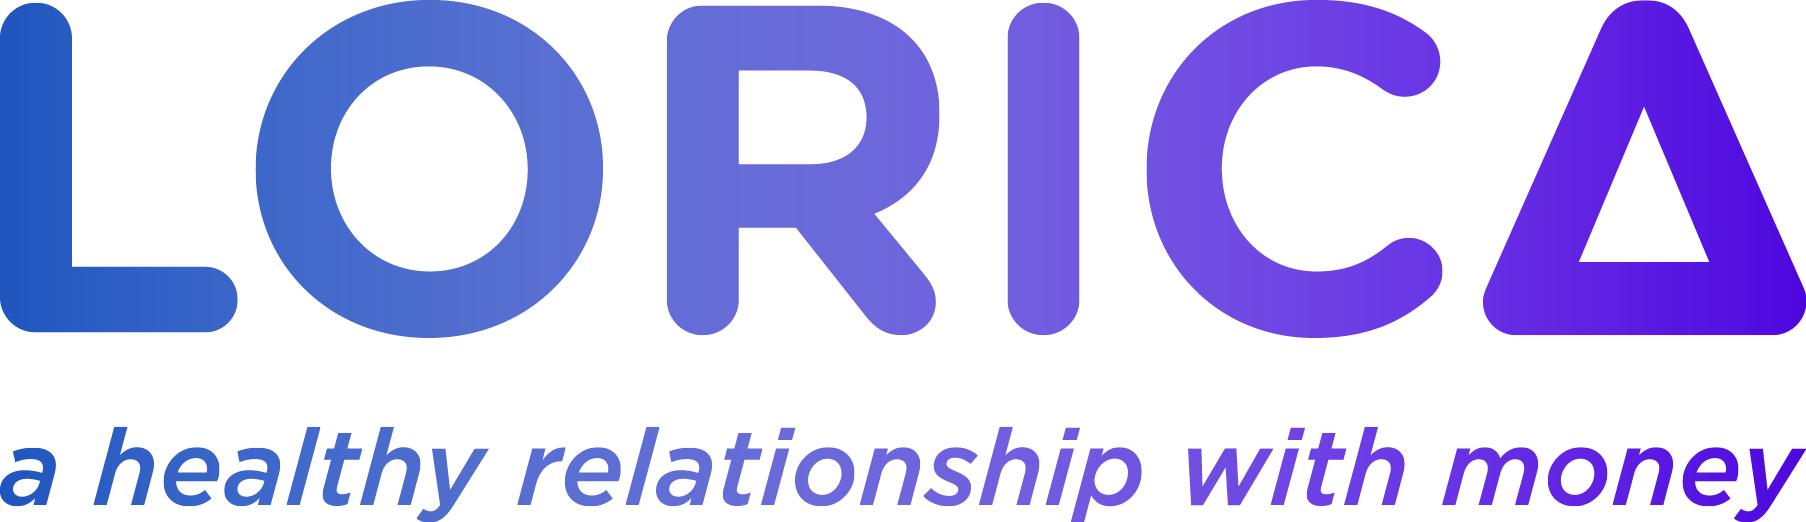 Lorica_Logo_Gradient